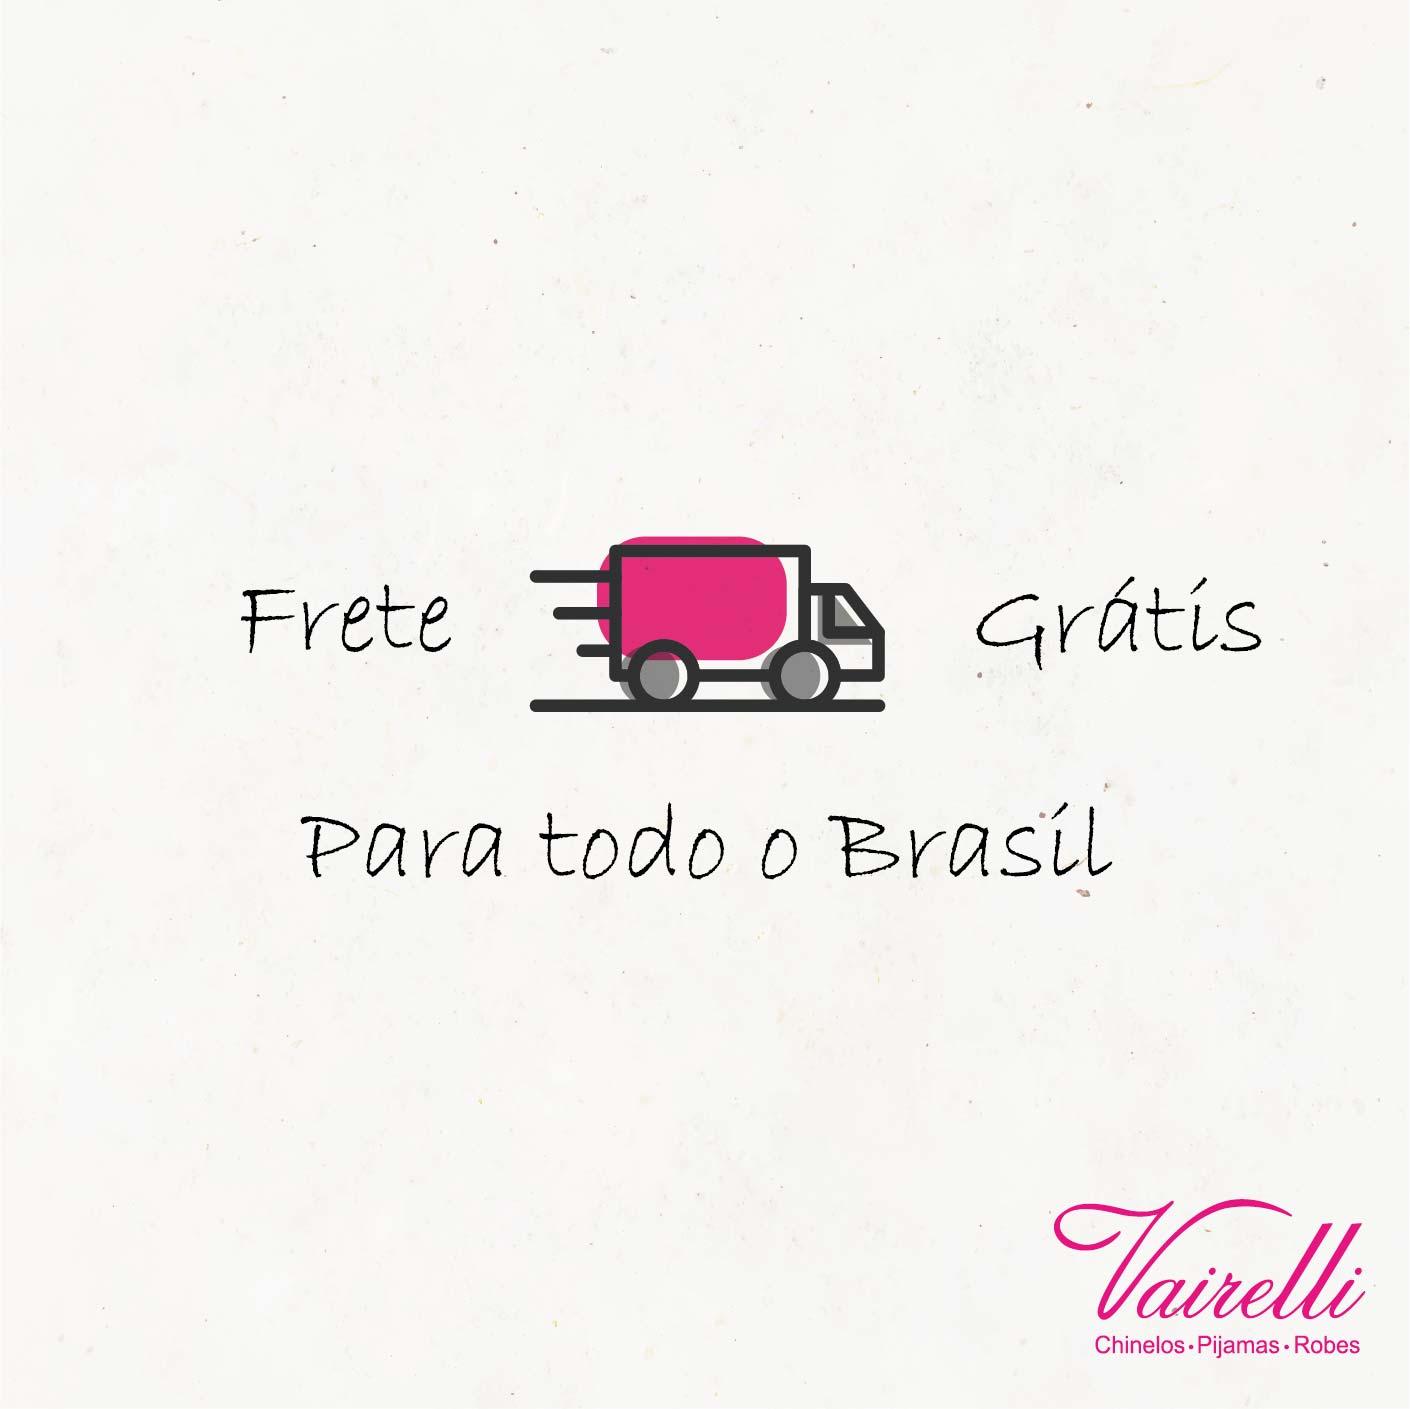 Camisão Feminino Verão Aurora   Vairelli  - Vairelli Chinelos Pijamas Robes